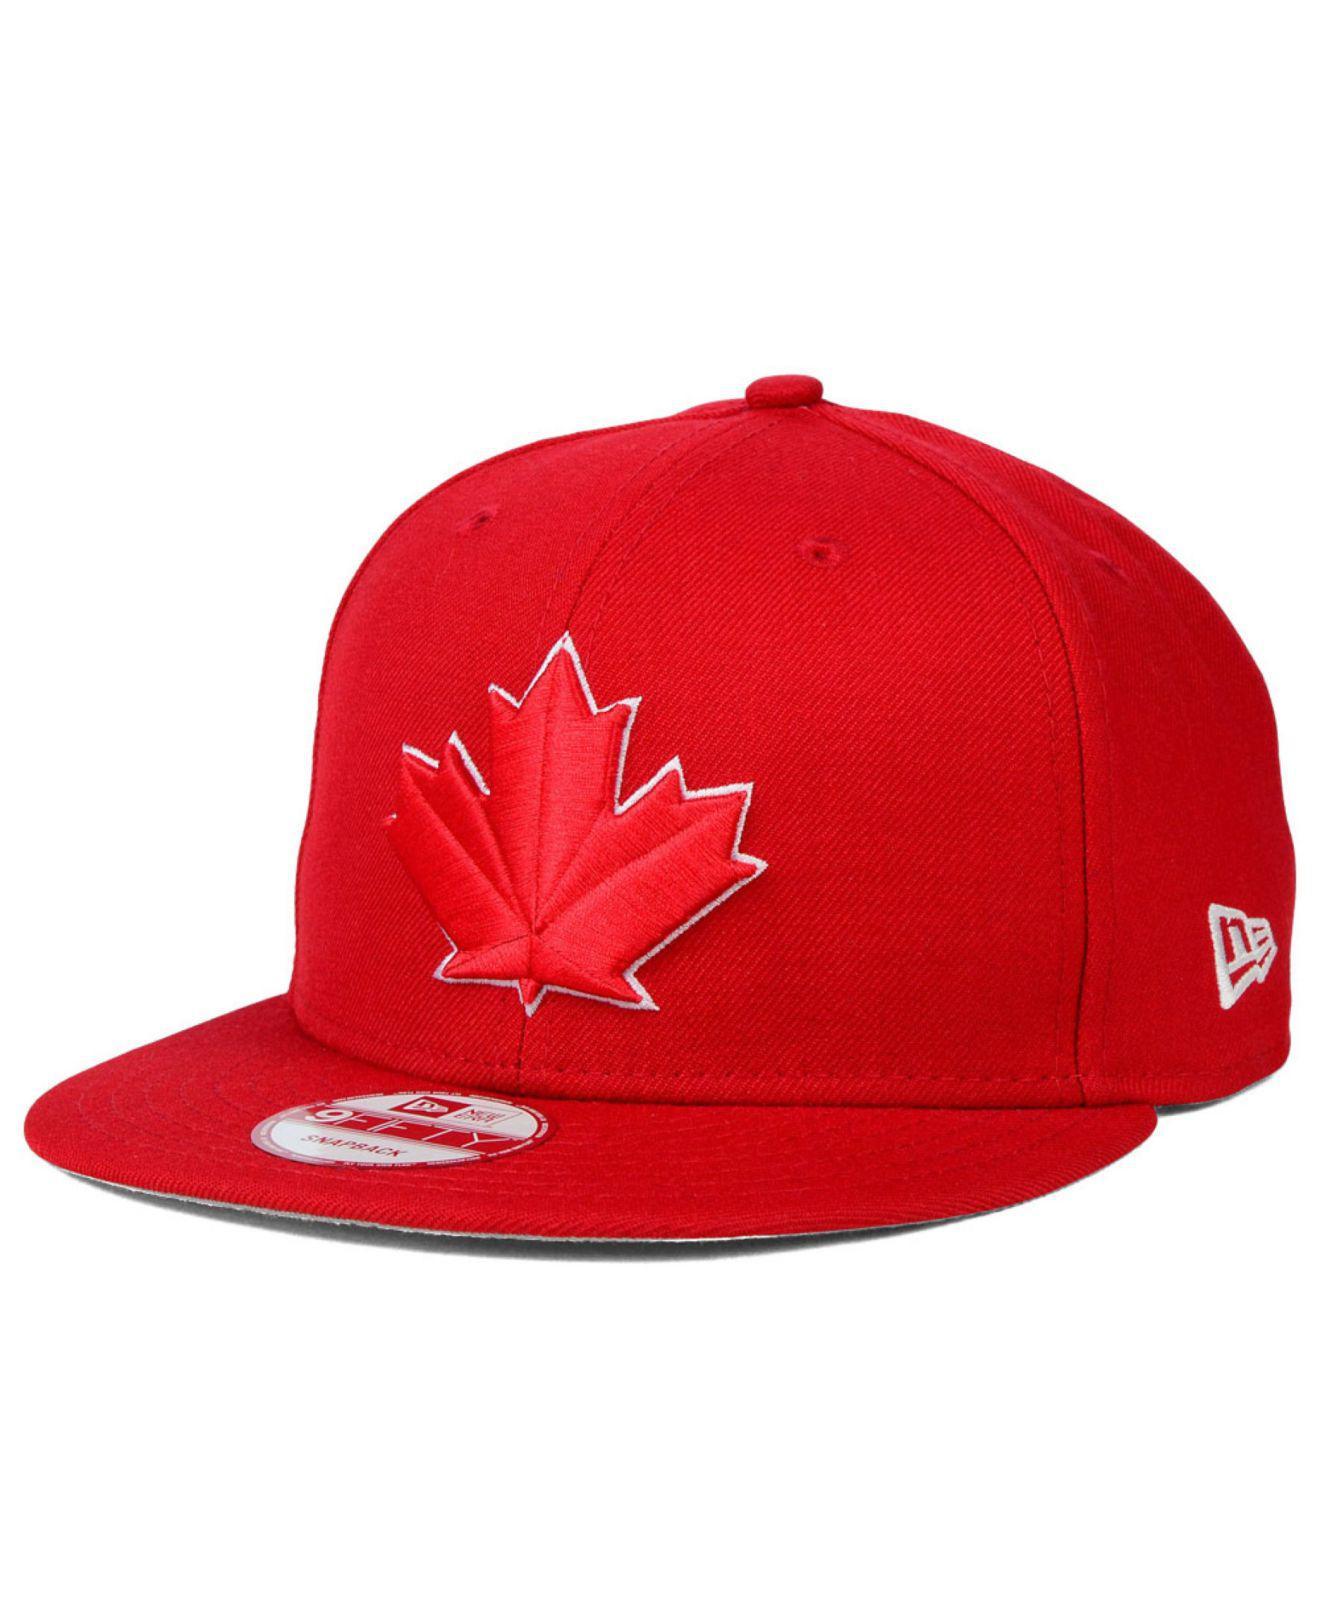 e8412261384 Lyst - KTZ Toronto Blue Jays 9fifty Snapback Cap in Red for Men